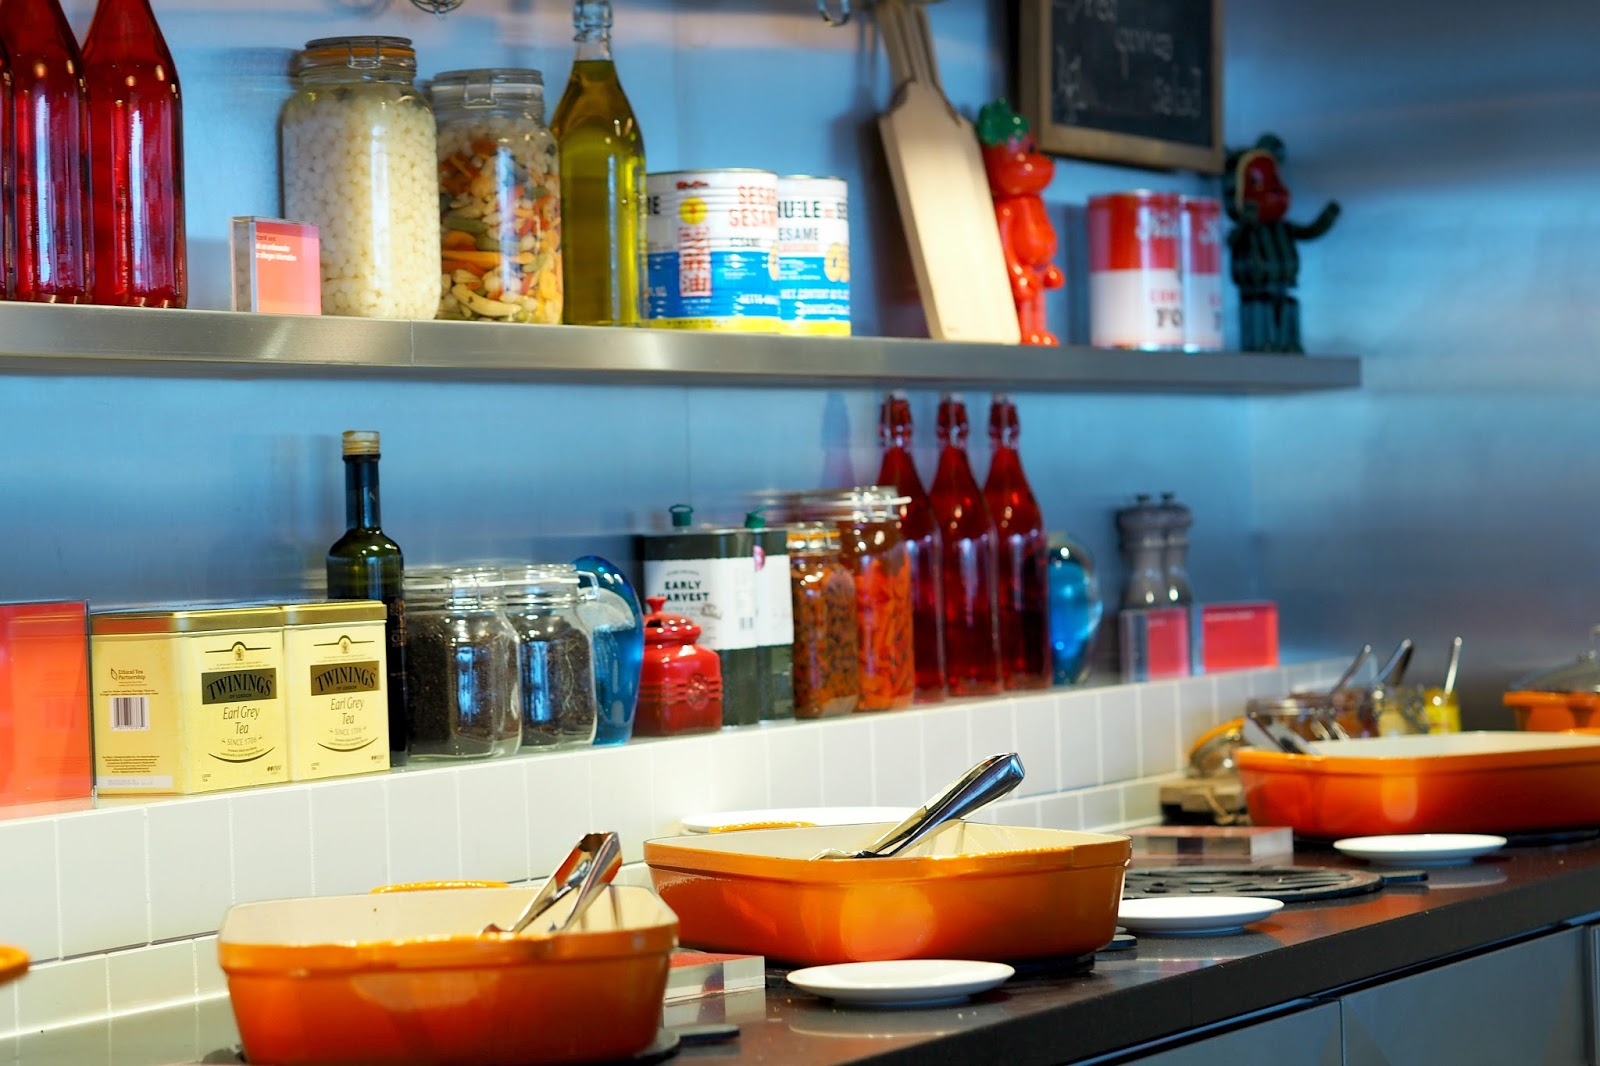 citizenm shoreditch breakfast spread review